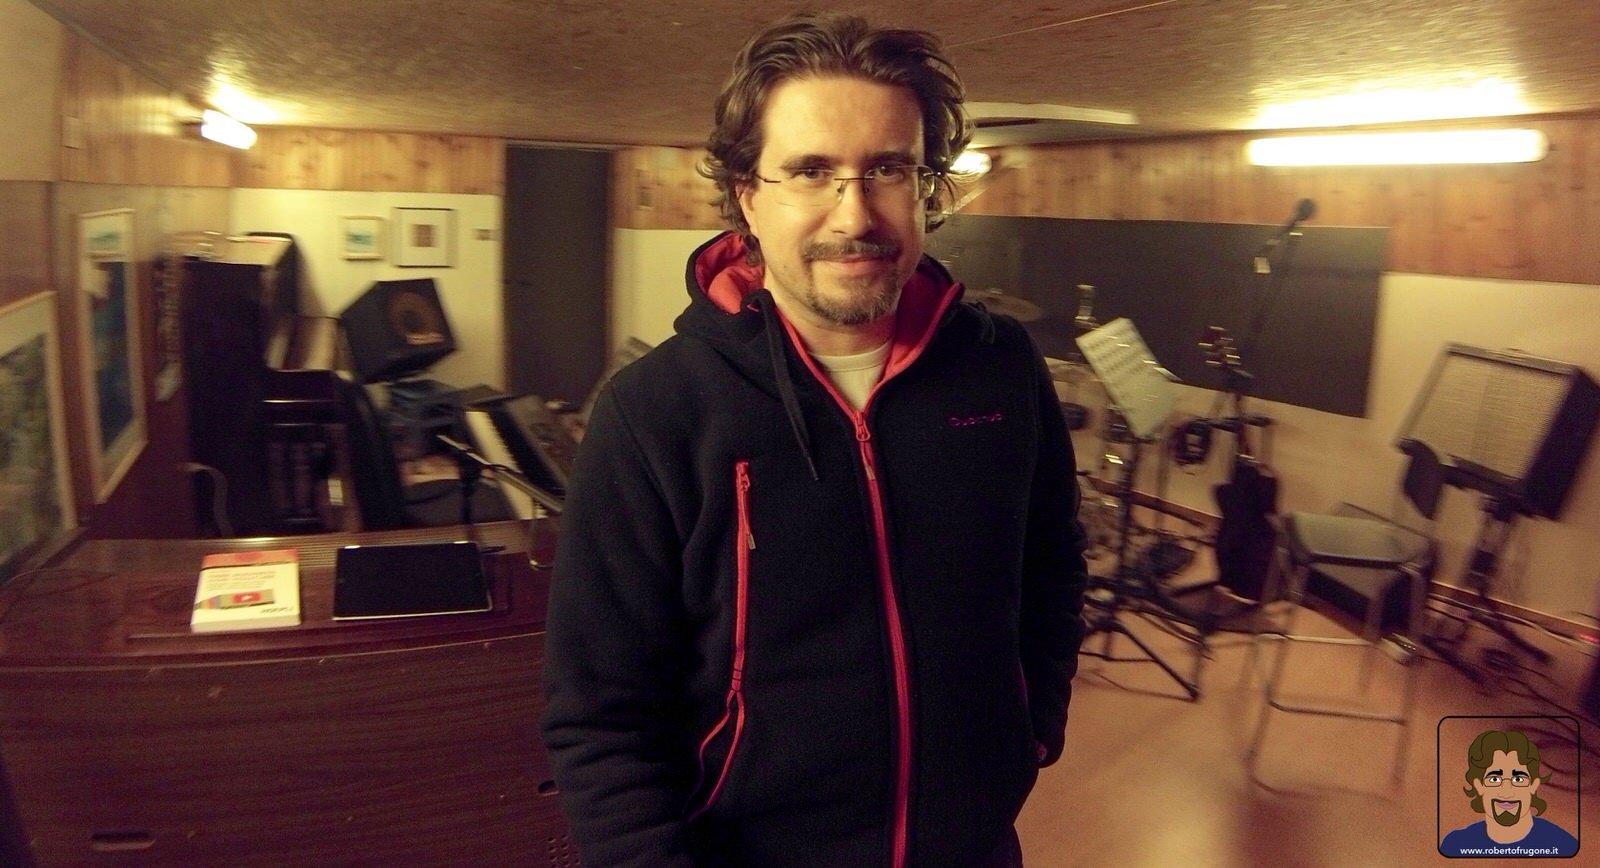 Totem Studio Sala Prove Musicali Casarza Ligure Roberto Frugone 02